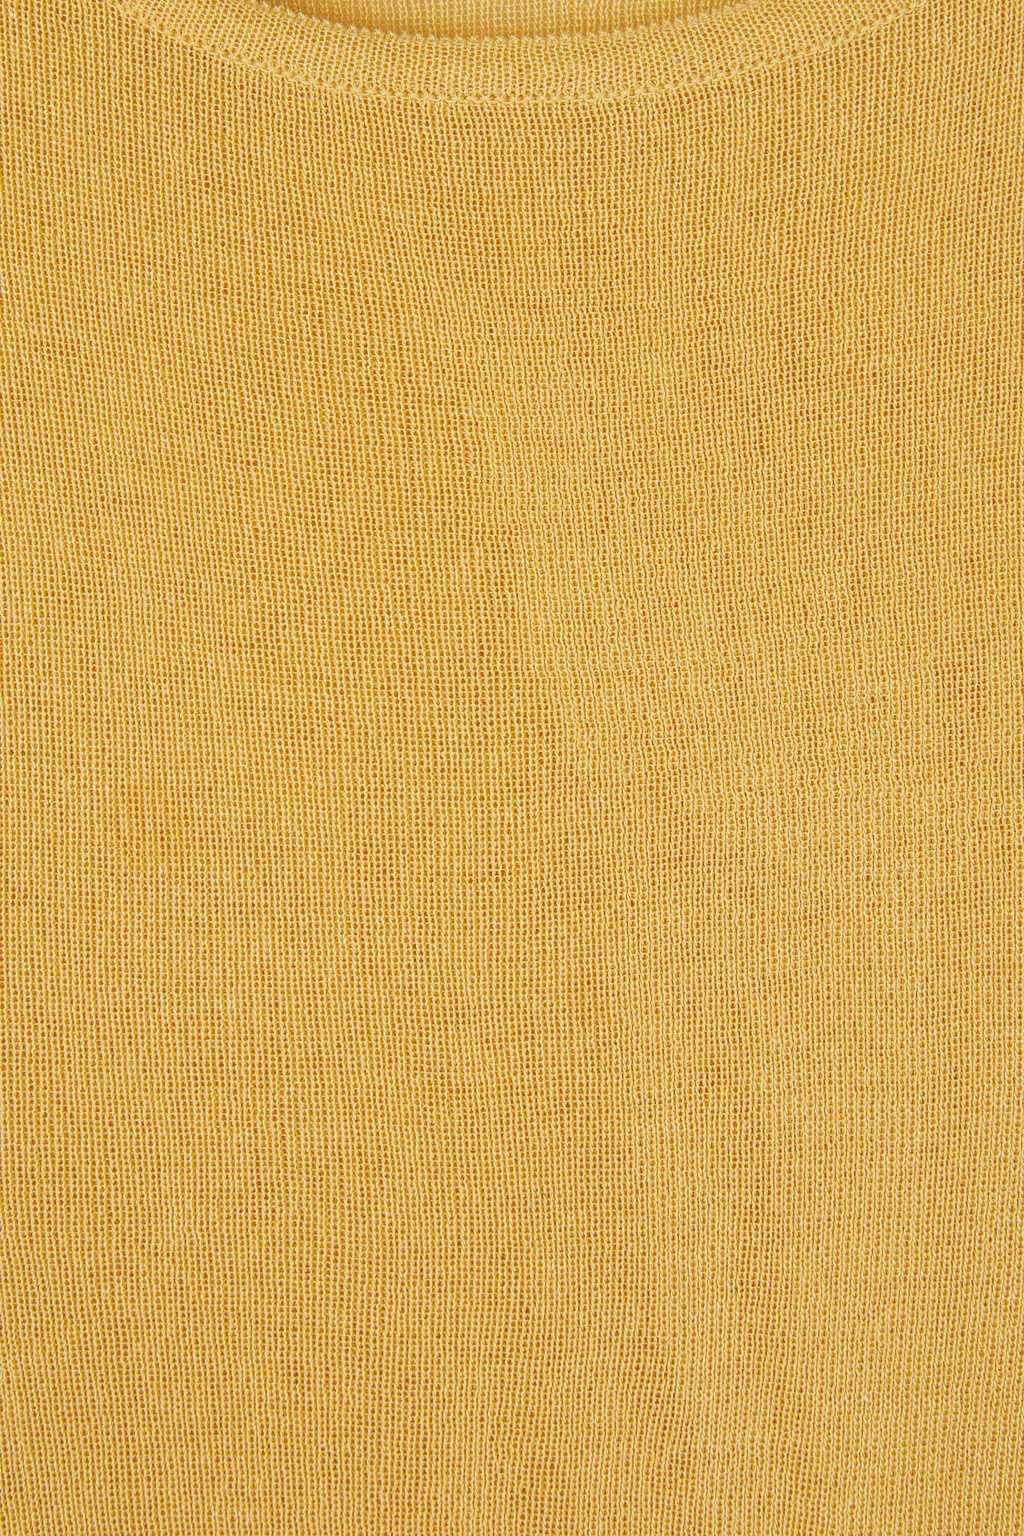 TShirt K010 Yellow 7